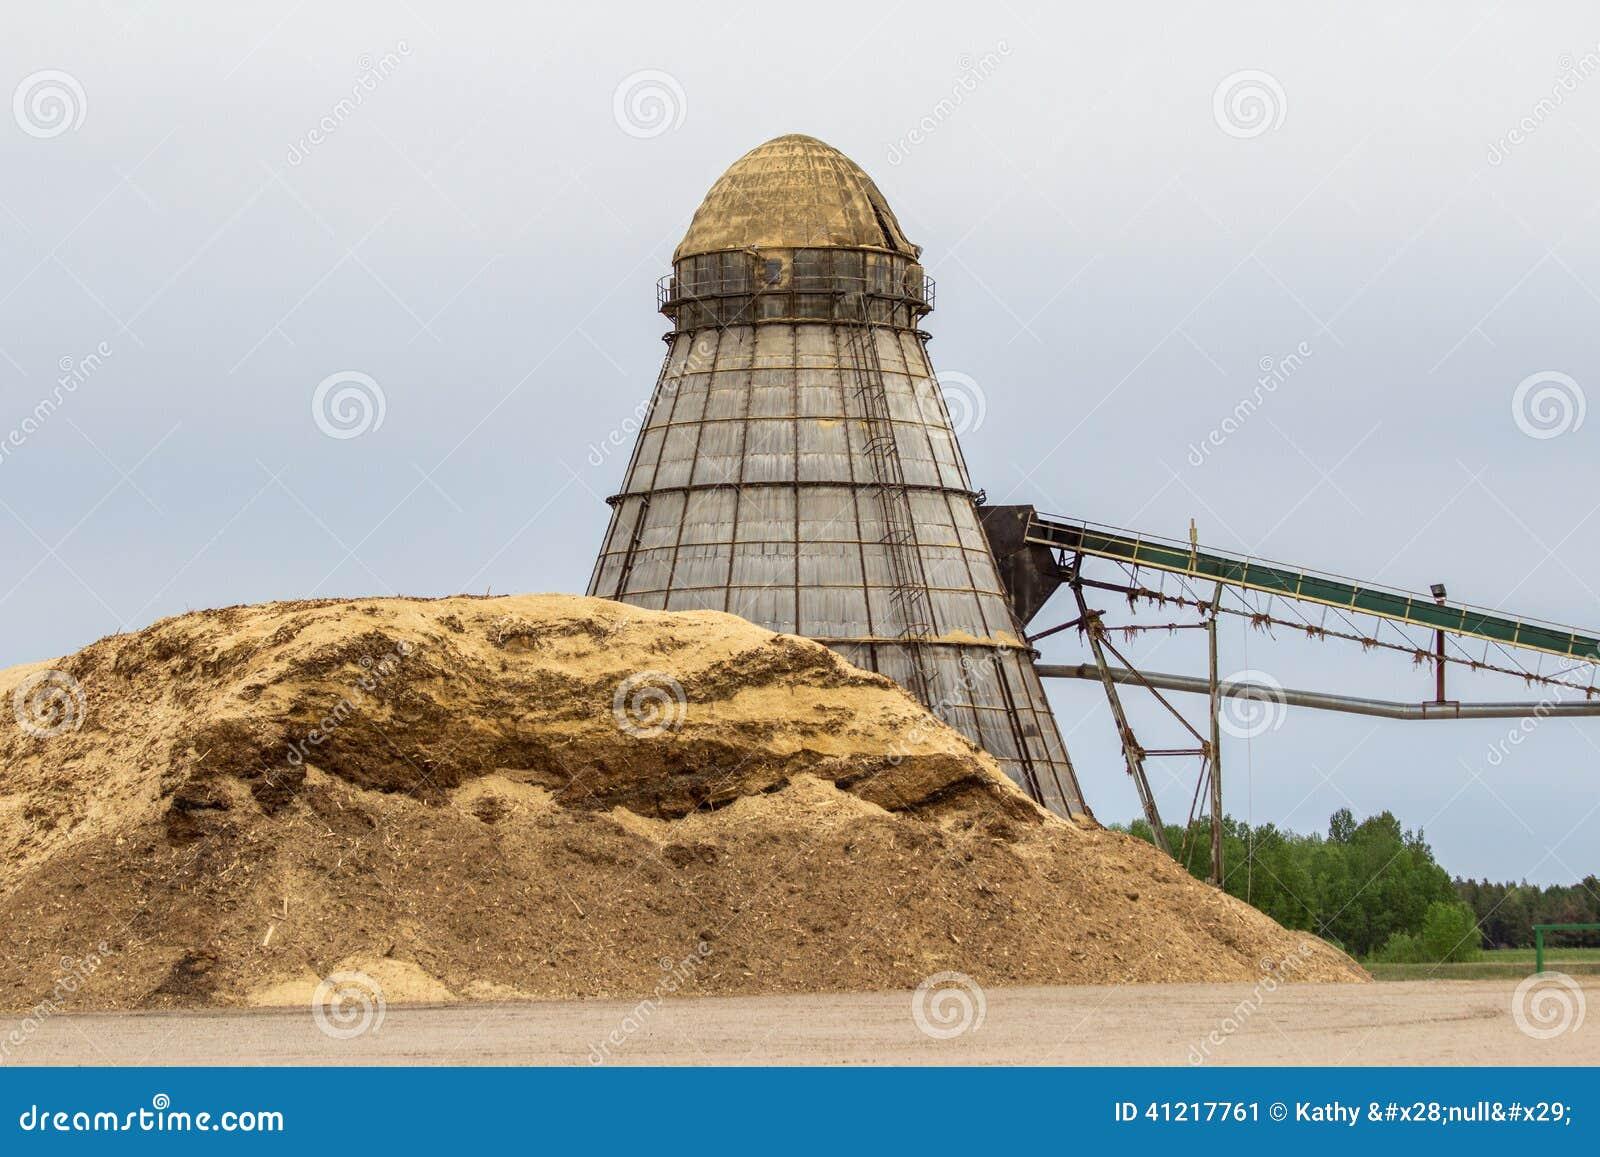 Industrial Wood Chip Burner Stock Photo Image 41217761